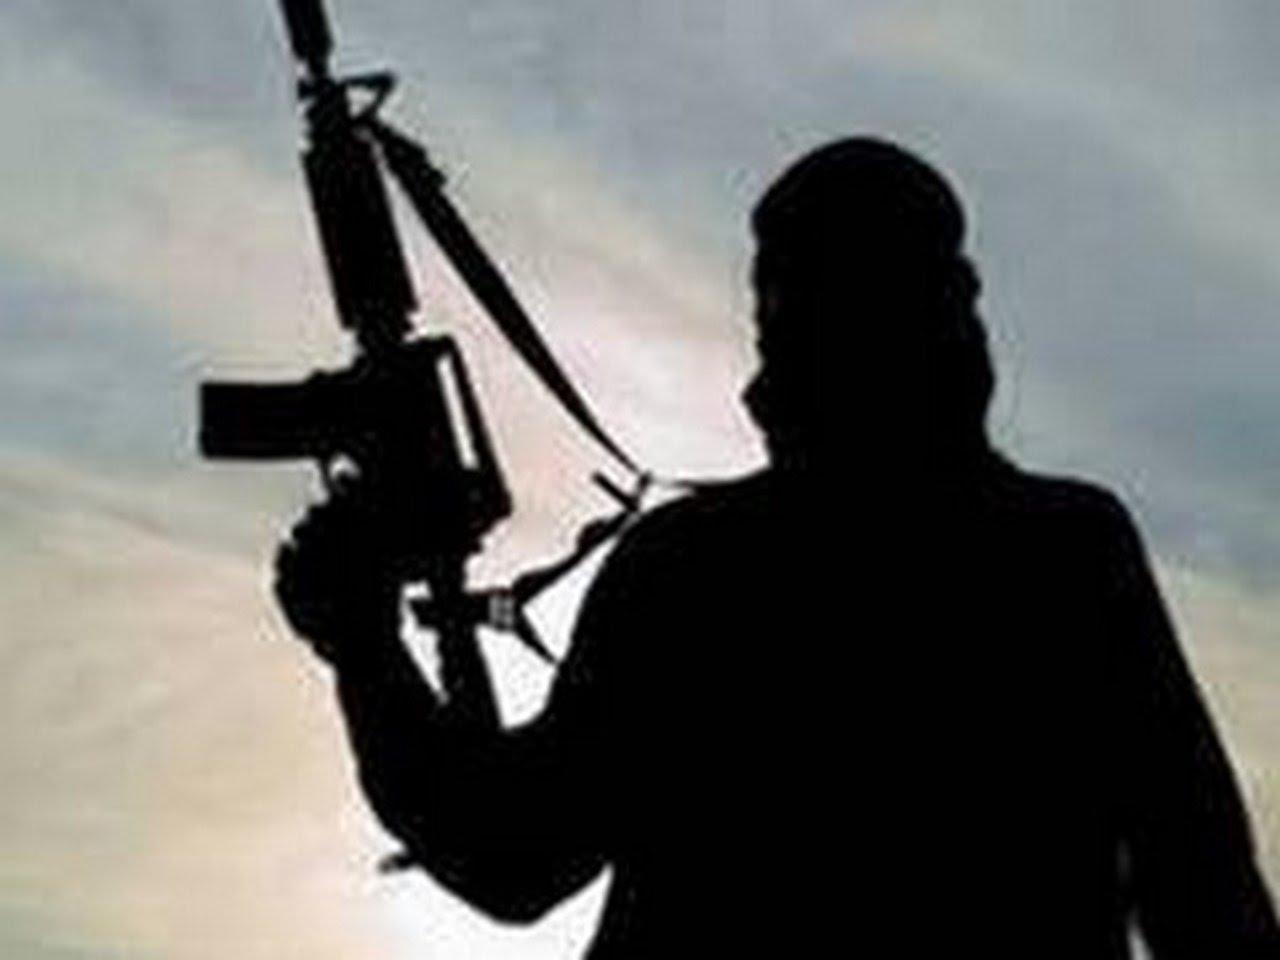 12 Naxals surrender in C'garh, 5 of them carrying cash rewards